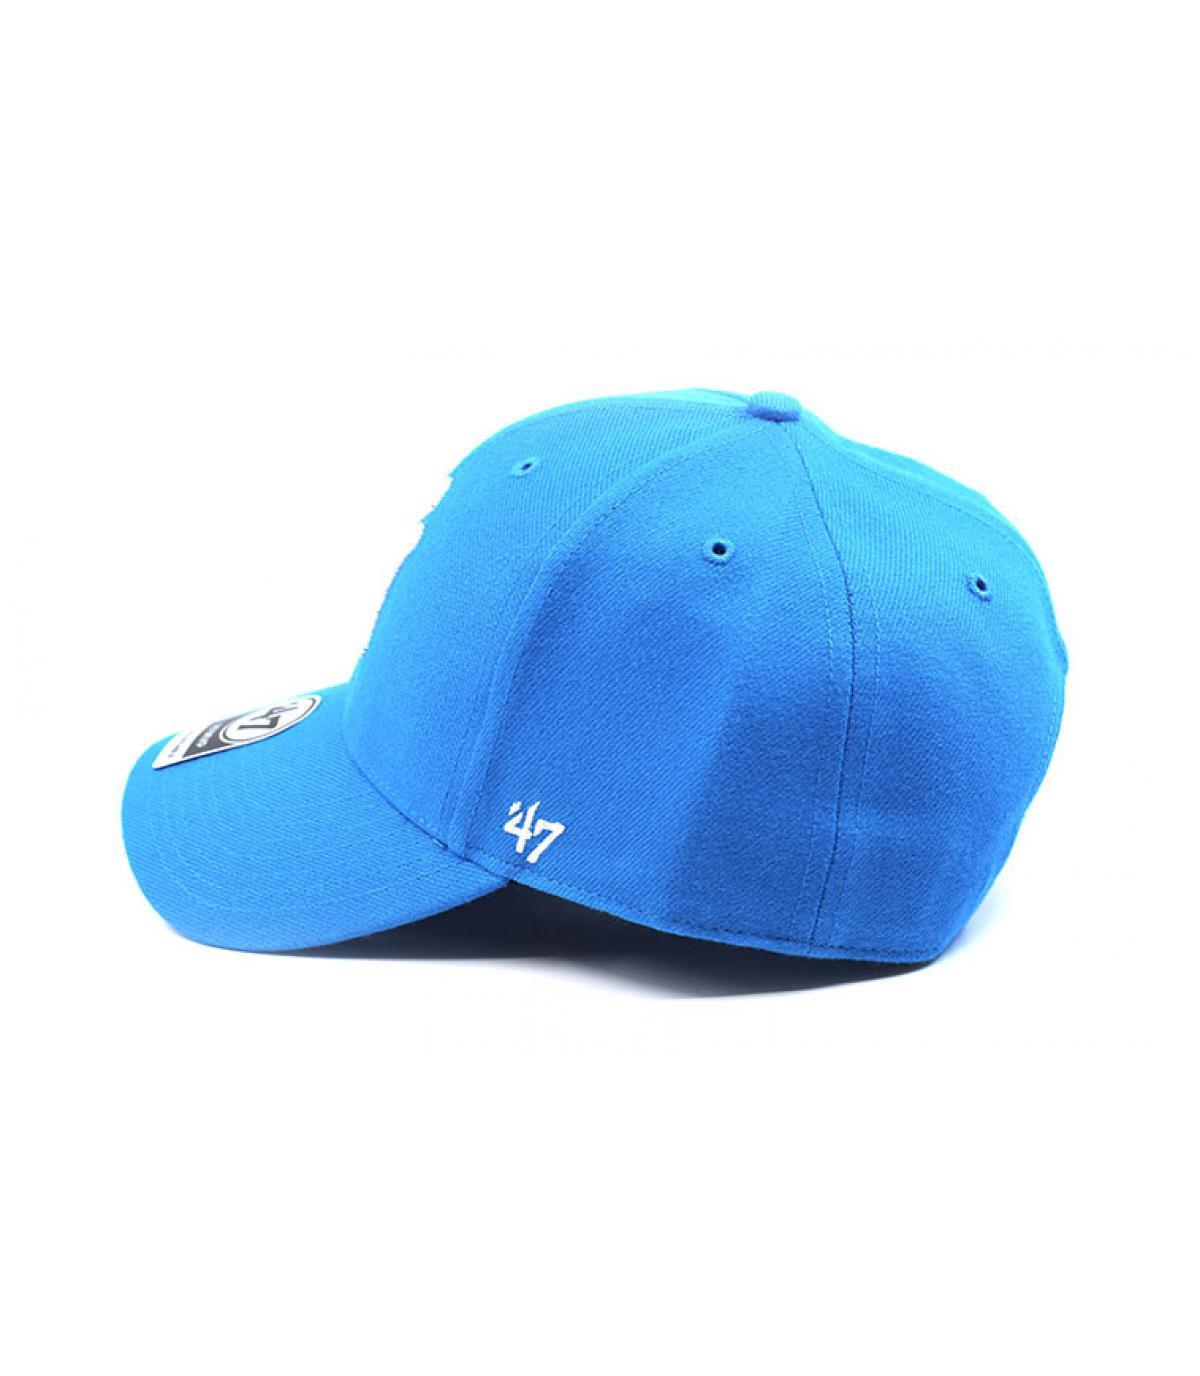 Dettagli MVP NY snapback glacier blue - image 4